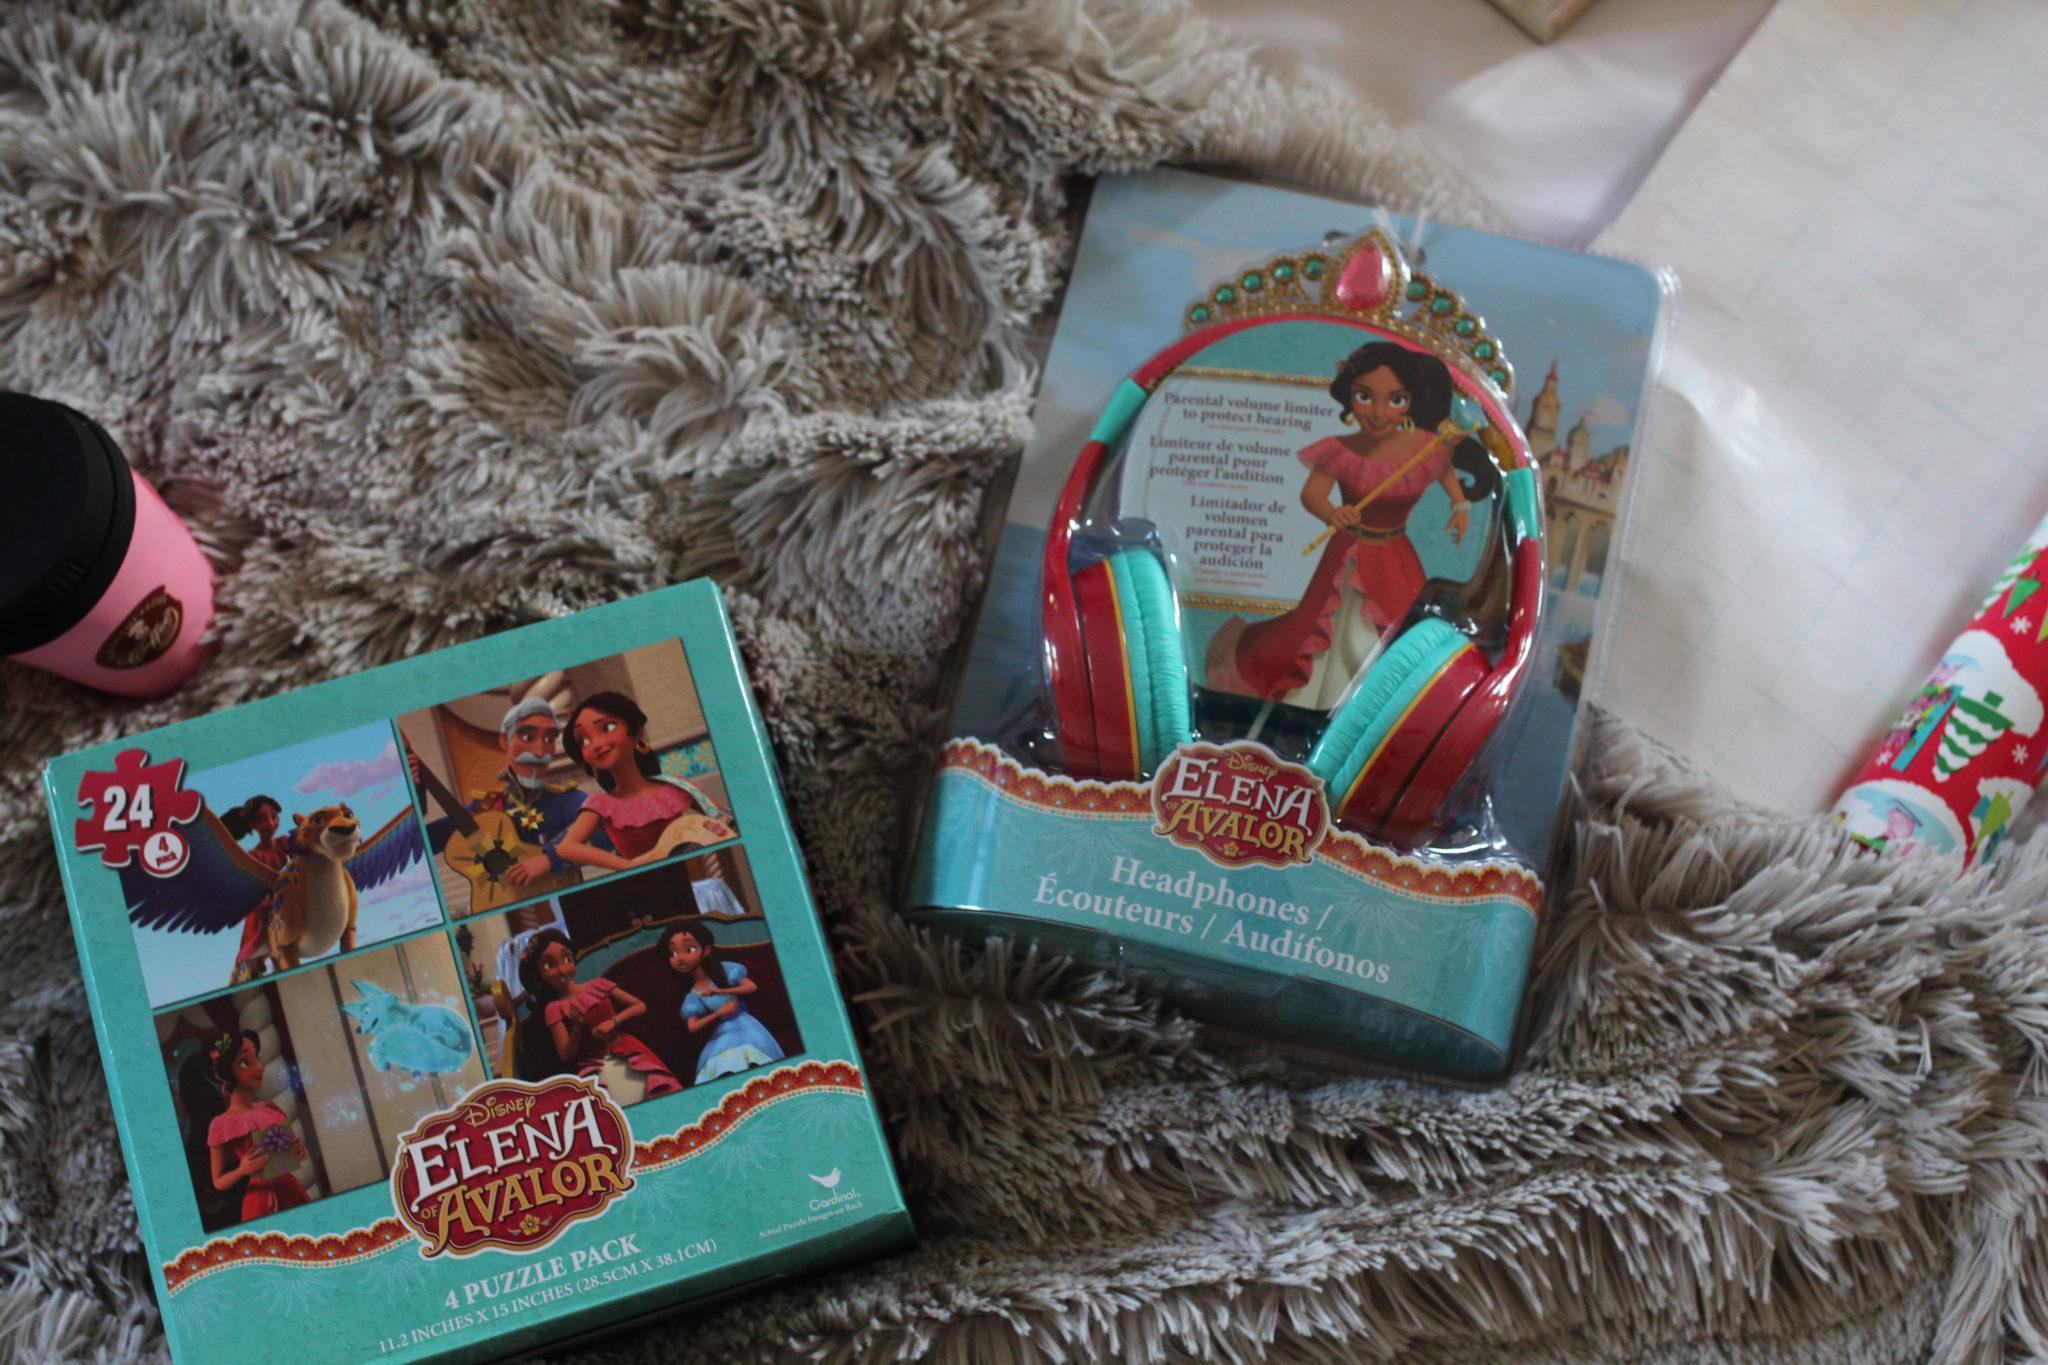 Disney Princess, Elena of Avalor, Disney headphones, Disney puzzles